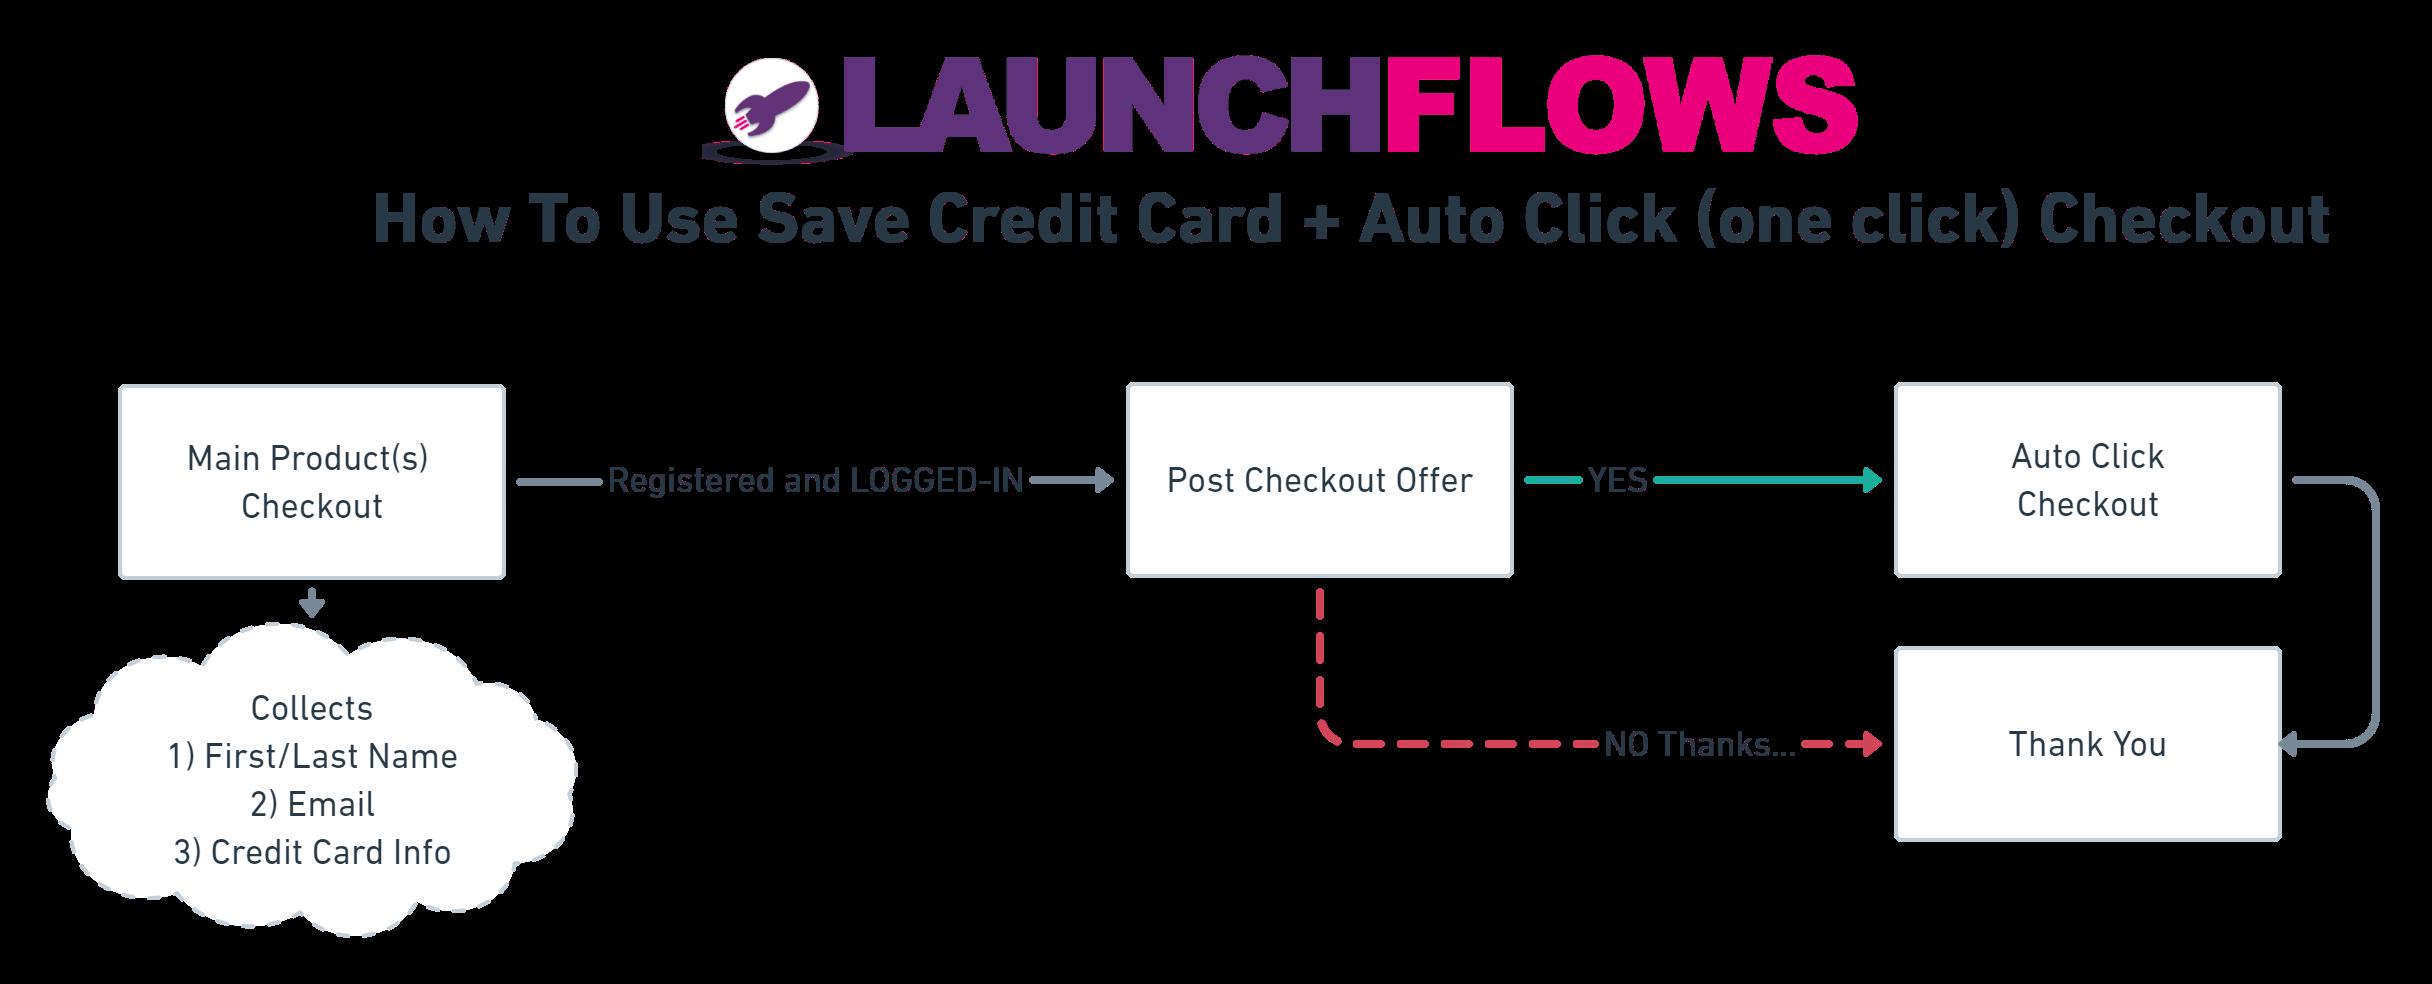 Save Credit Card And Autoclick Diagram